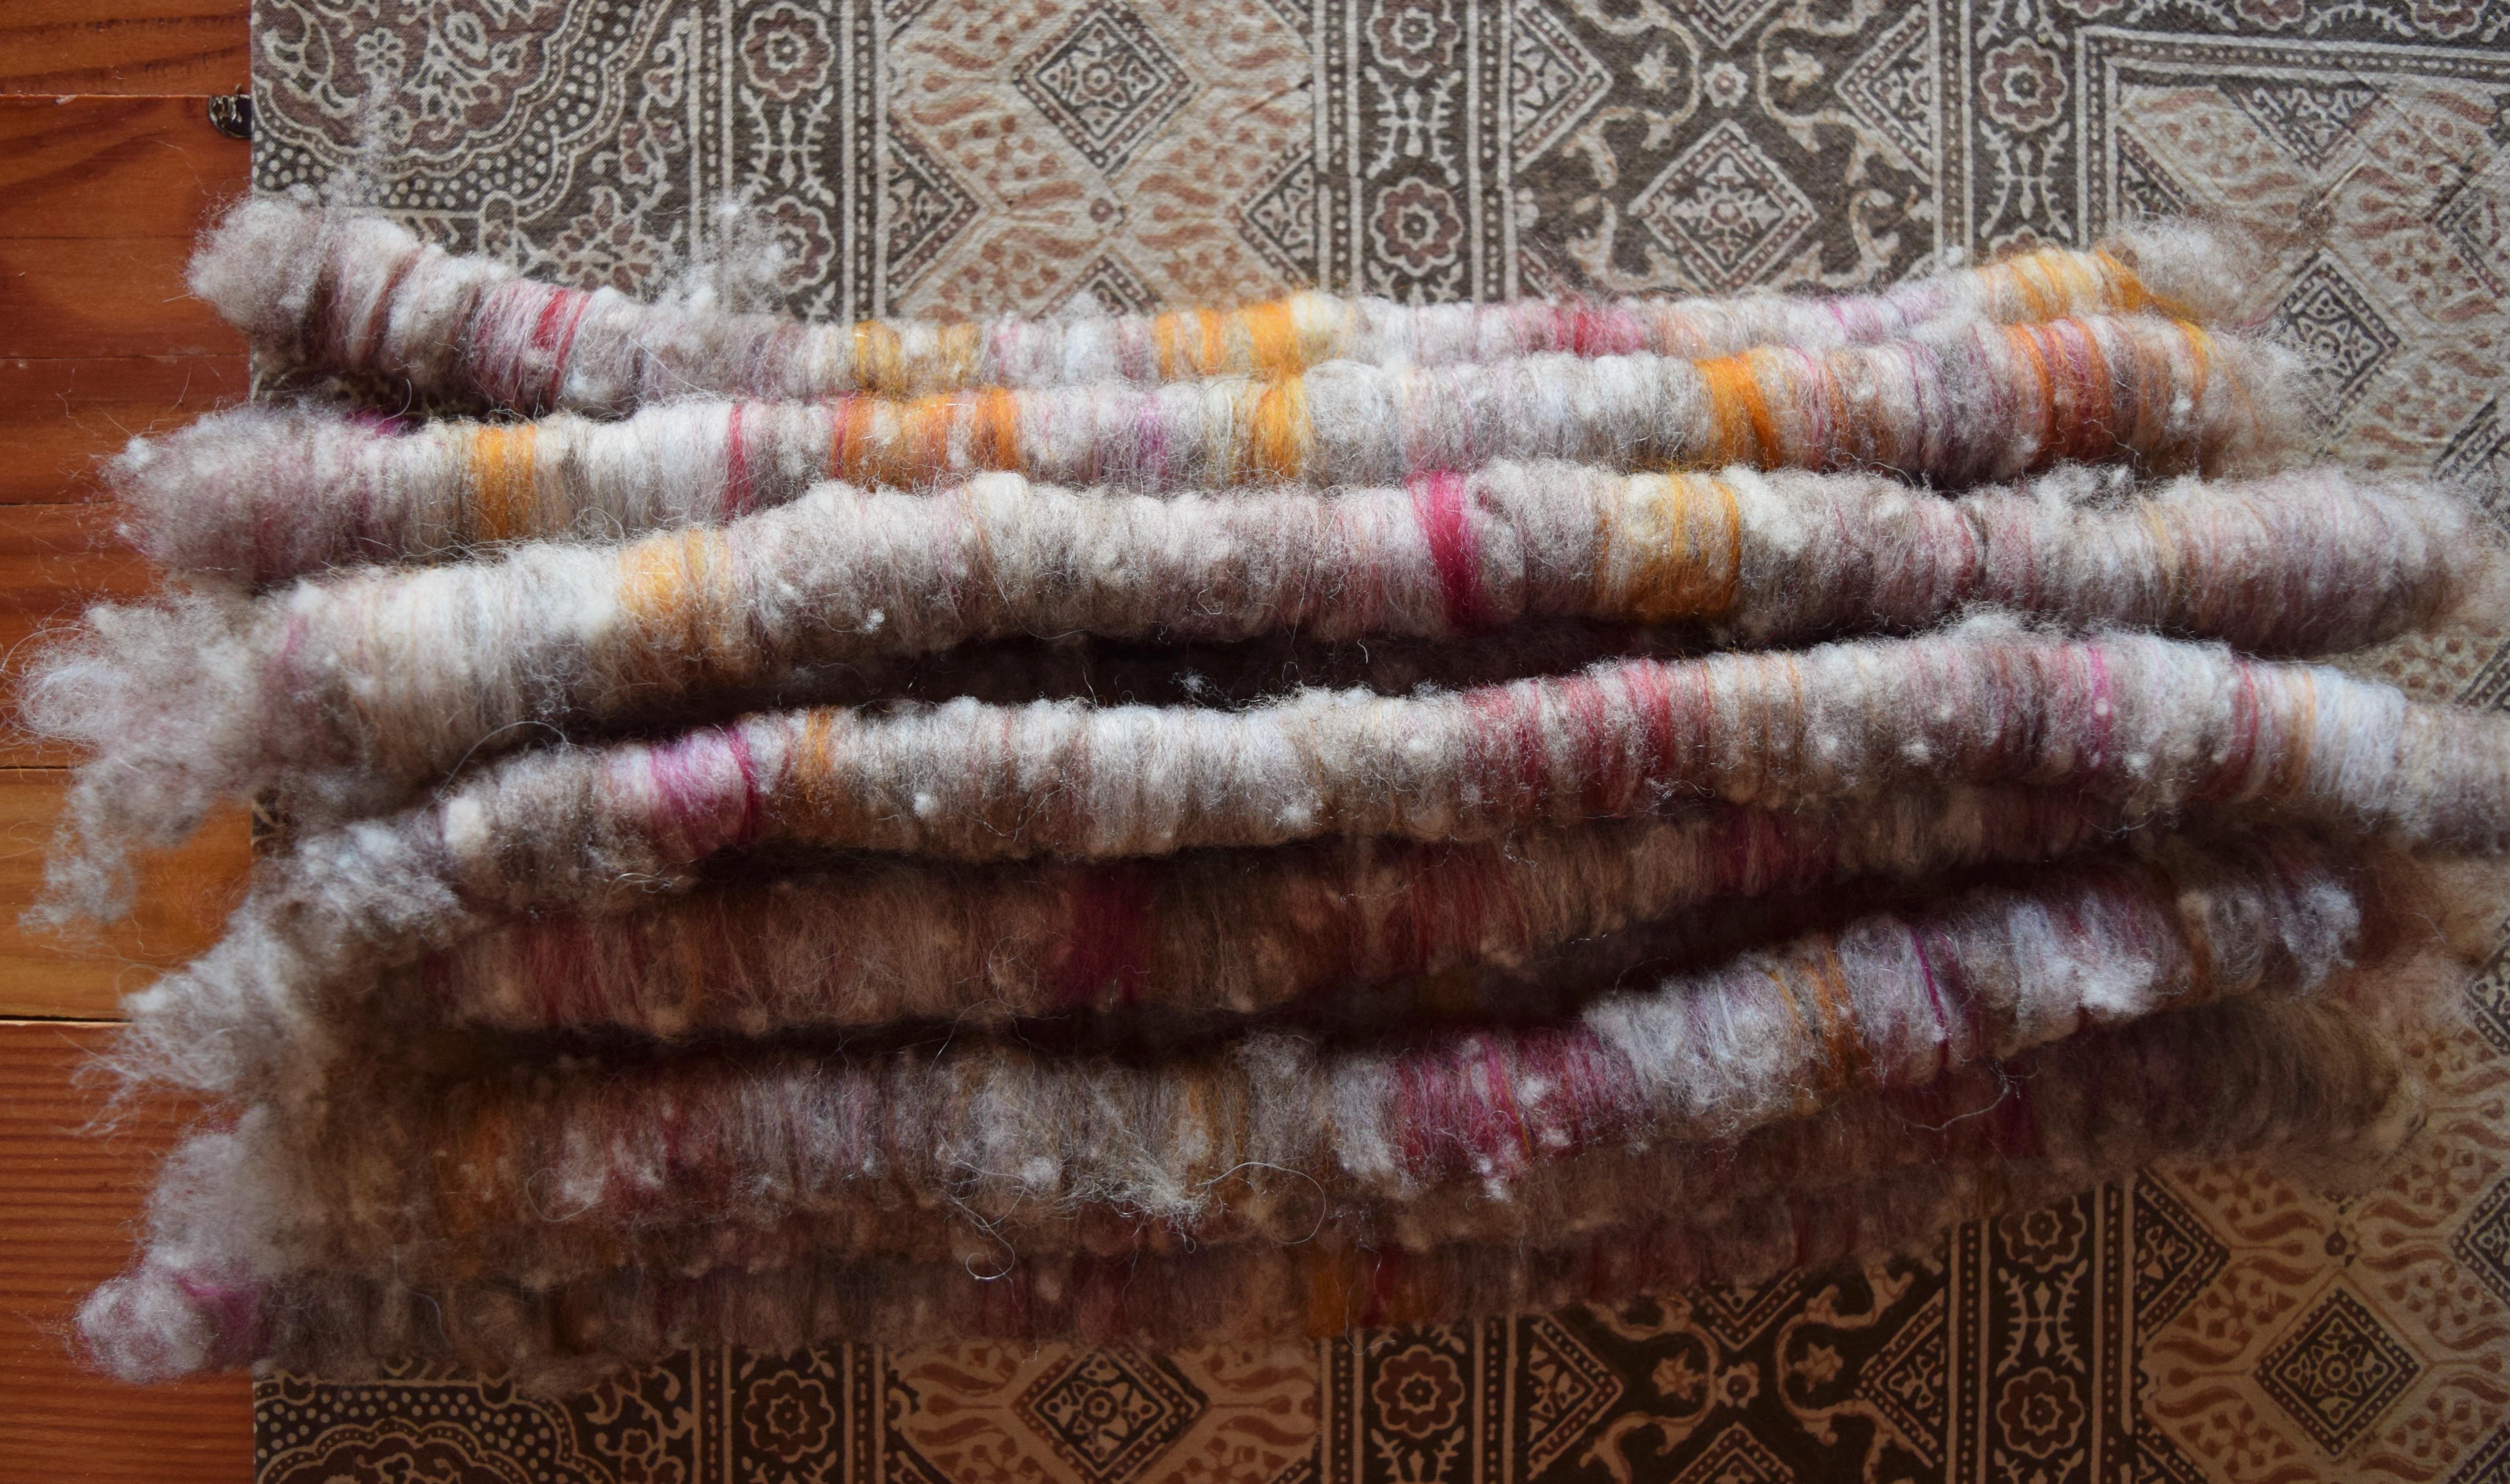 jenjoycedesign© tweed rolags